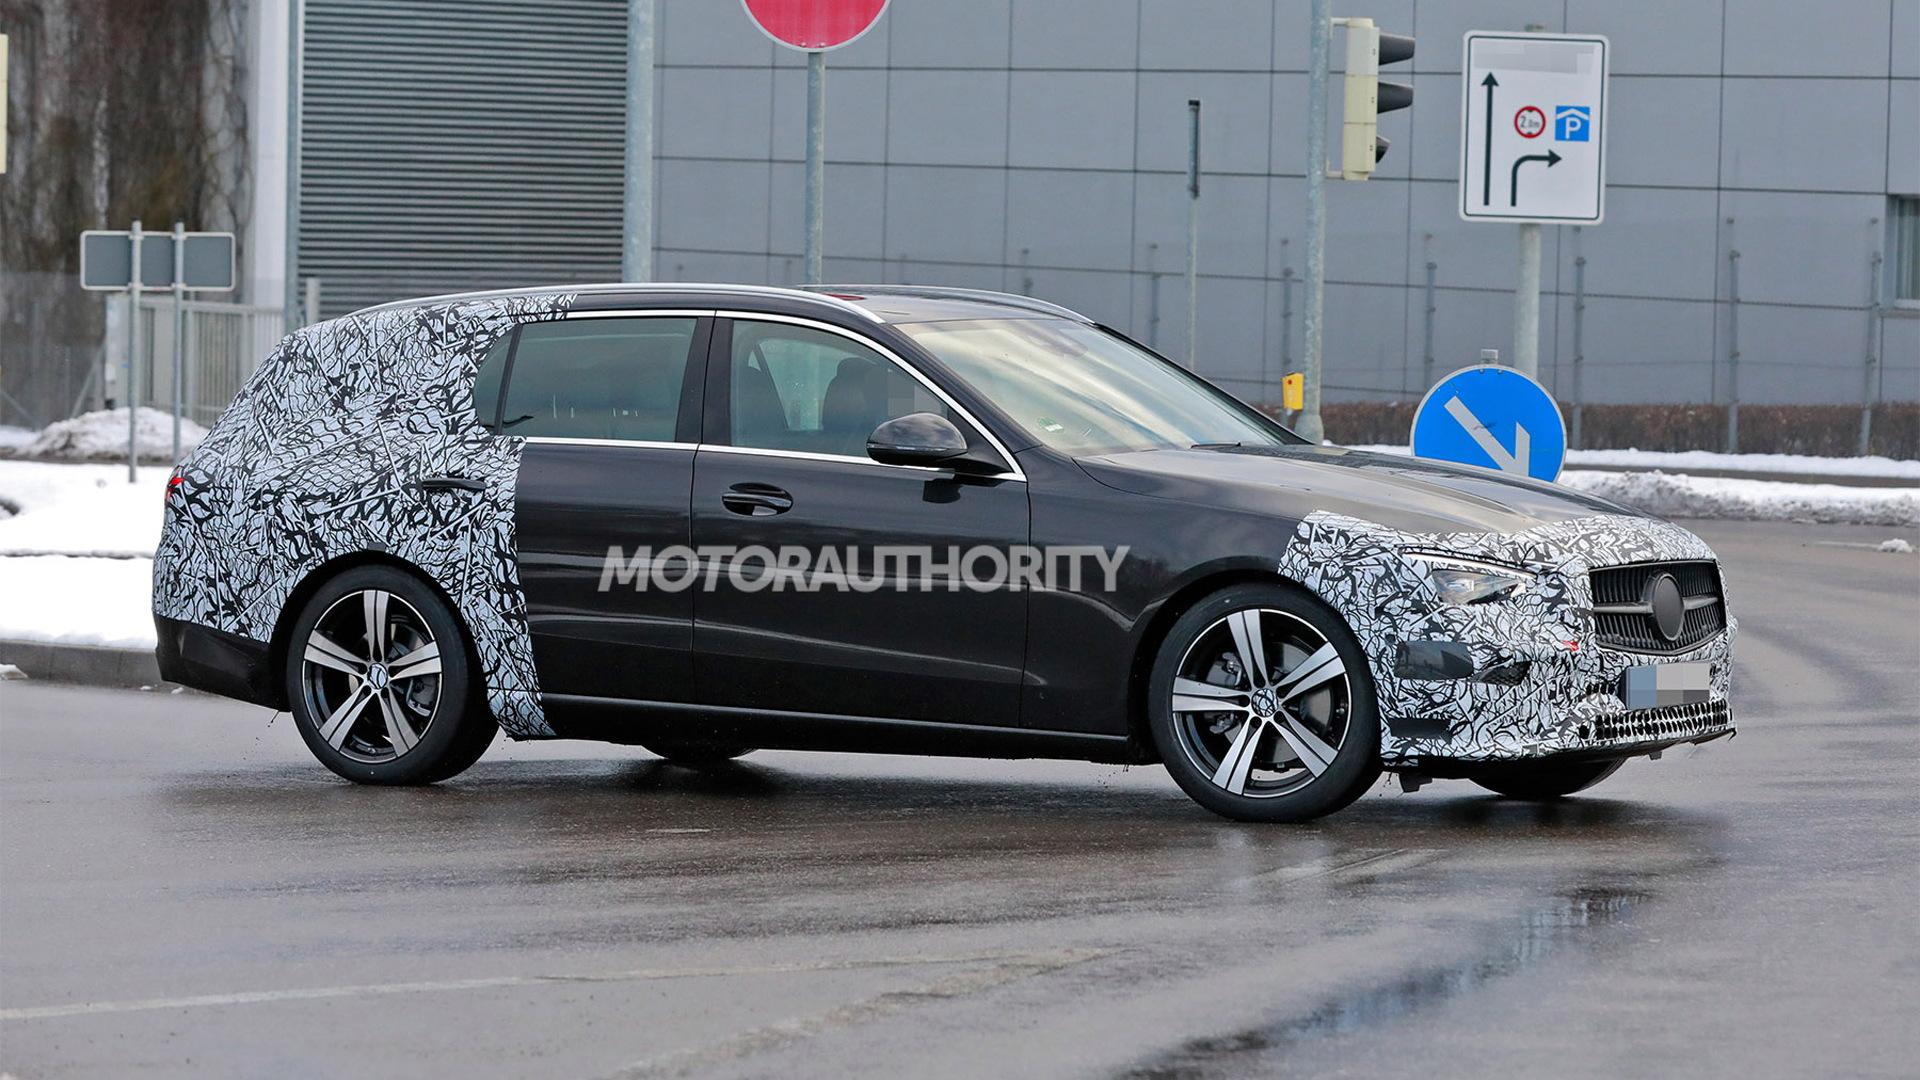 2022 Mercedes-Benz C-Class Wagon spy shots - Photo credit:S. Baldauf/SB-Medien